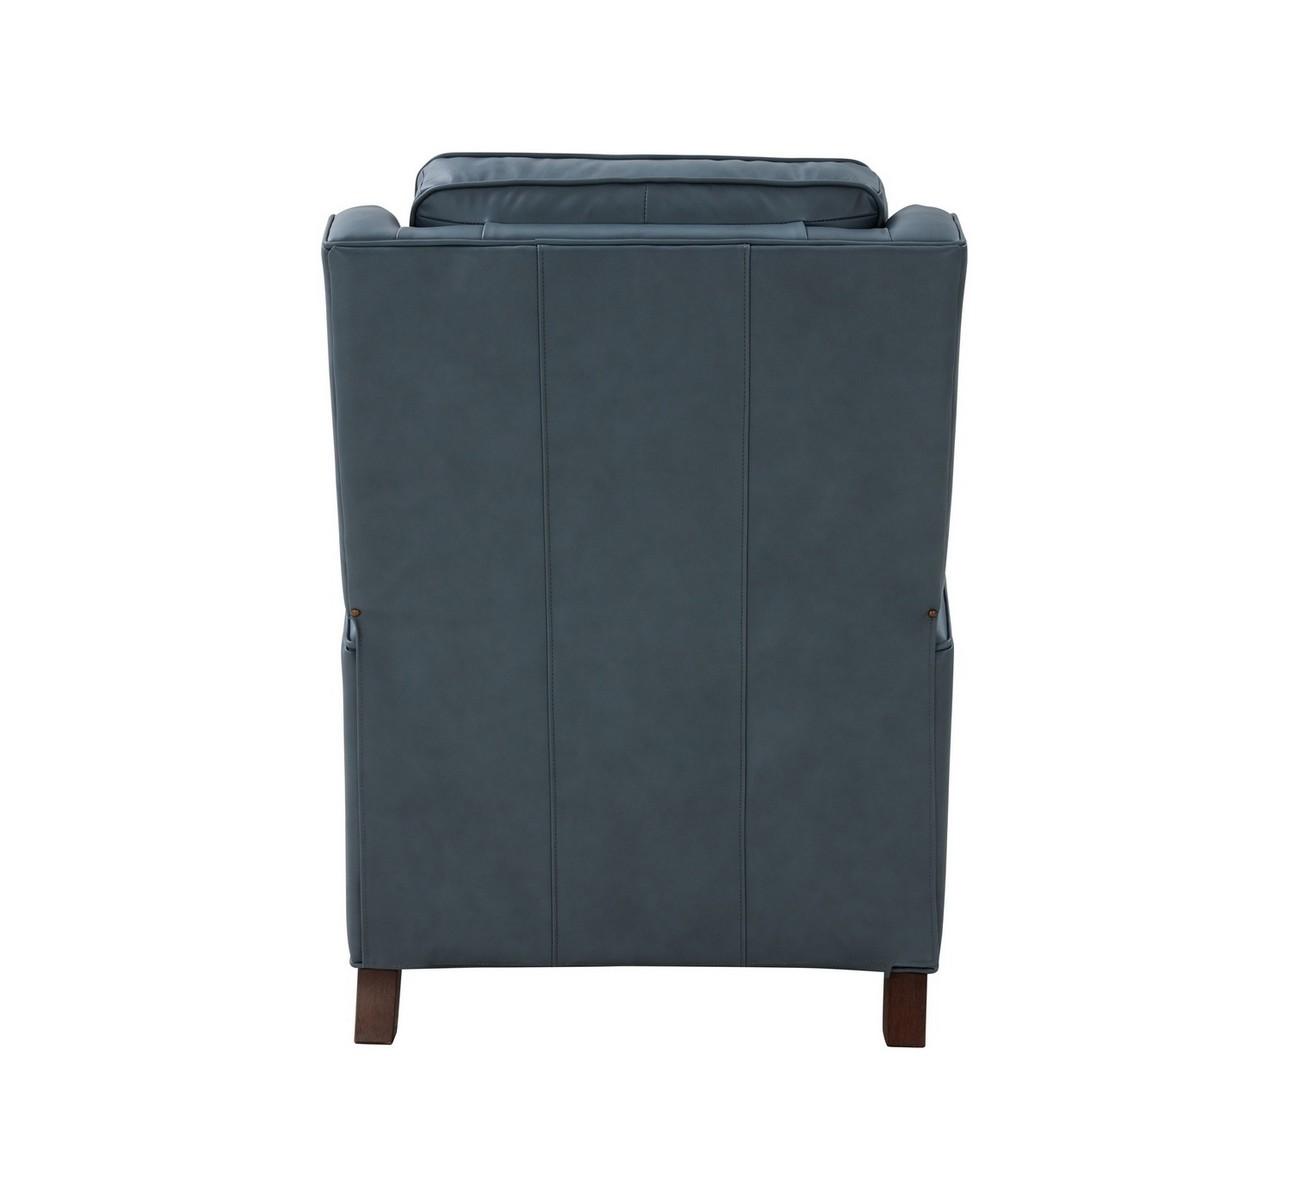 Barcalounger Nixon Recliner Chair - Corbett Steel Gray/All Leather